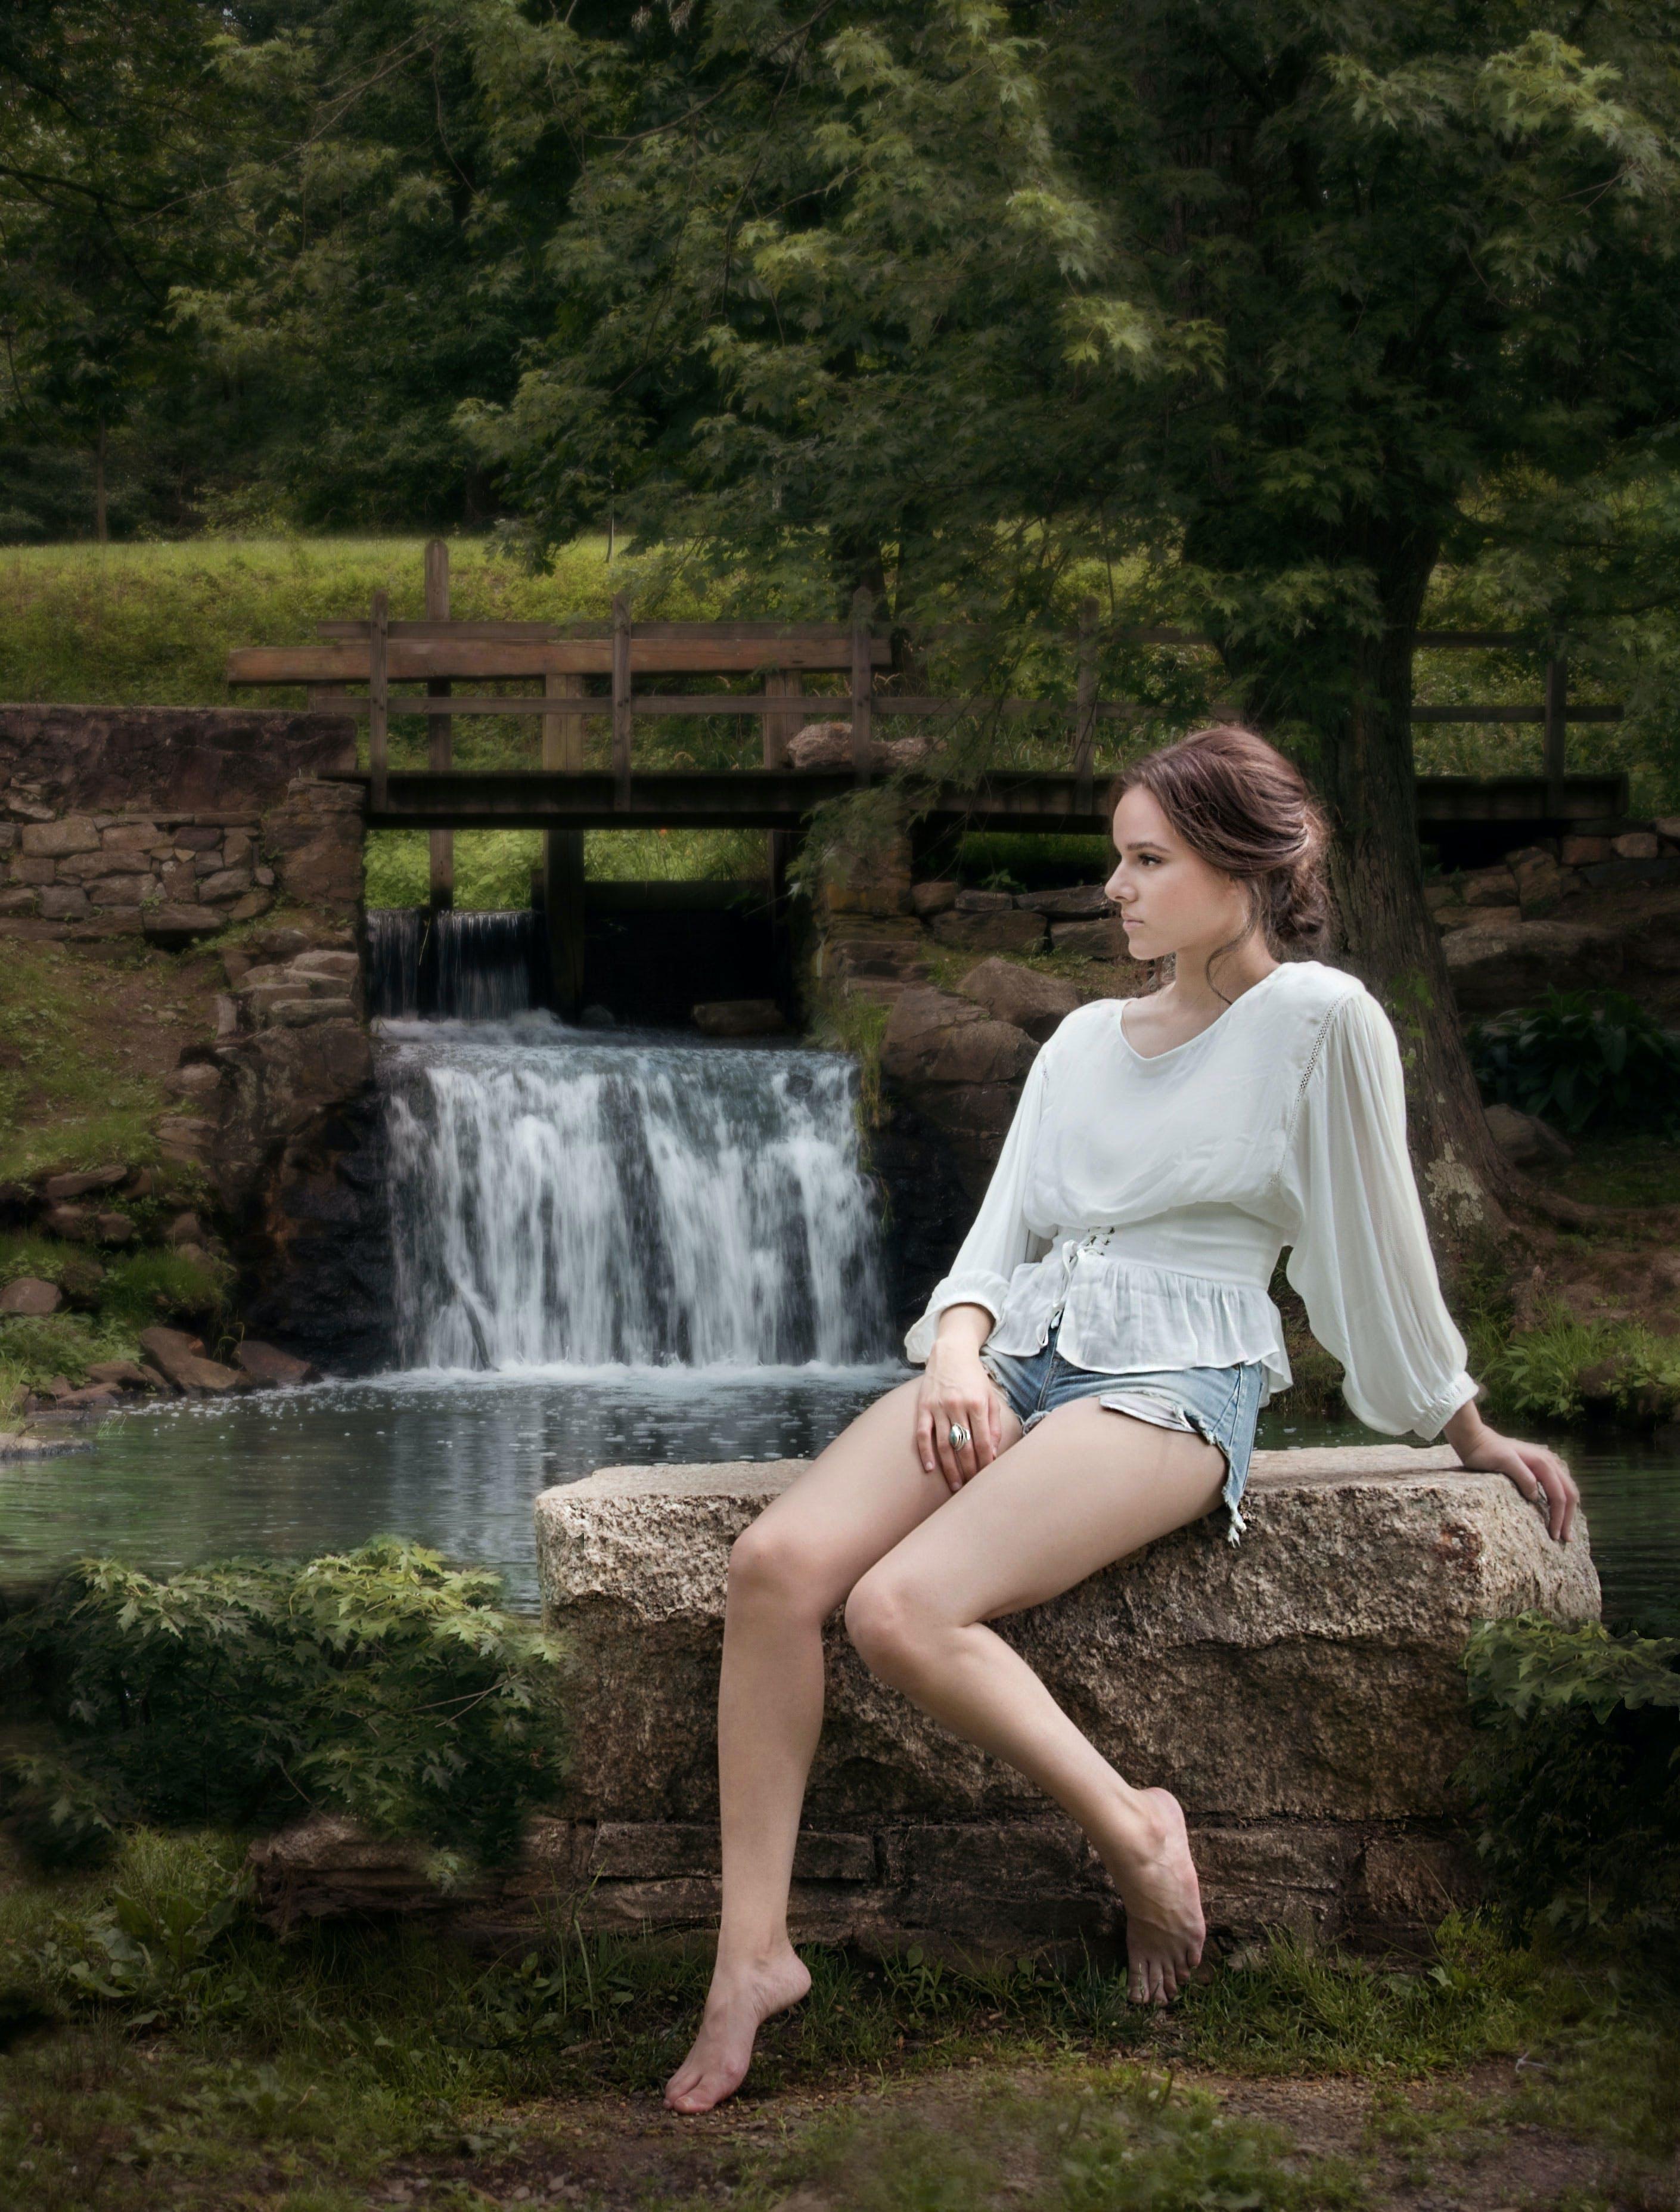 Woman Wearing White Long Sleeve Shirt Sitting Near Waterfalls